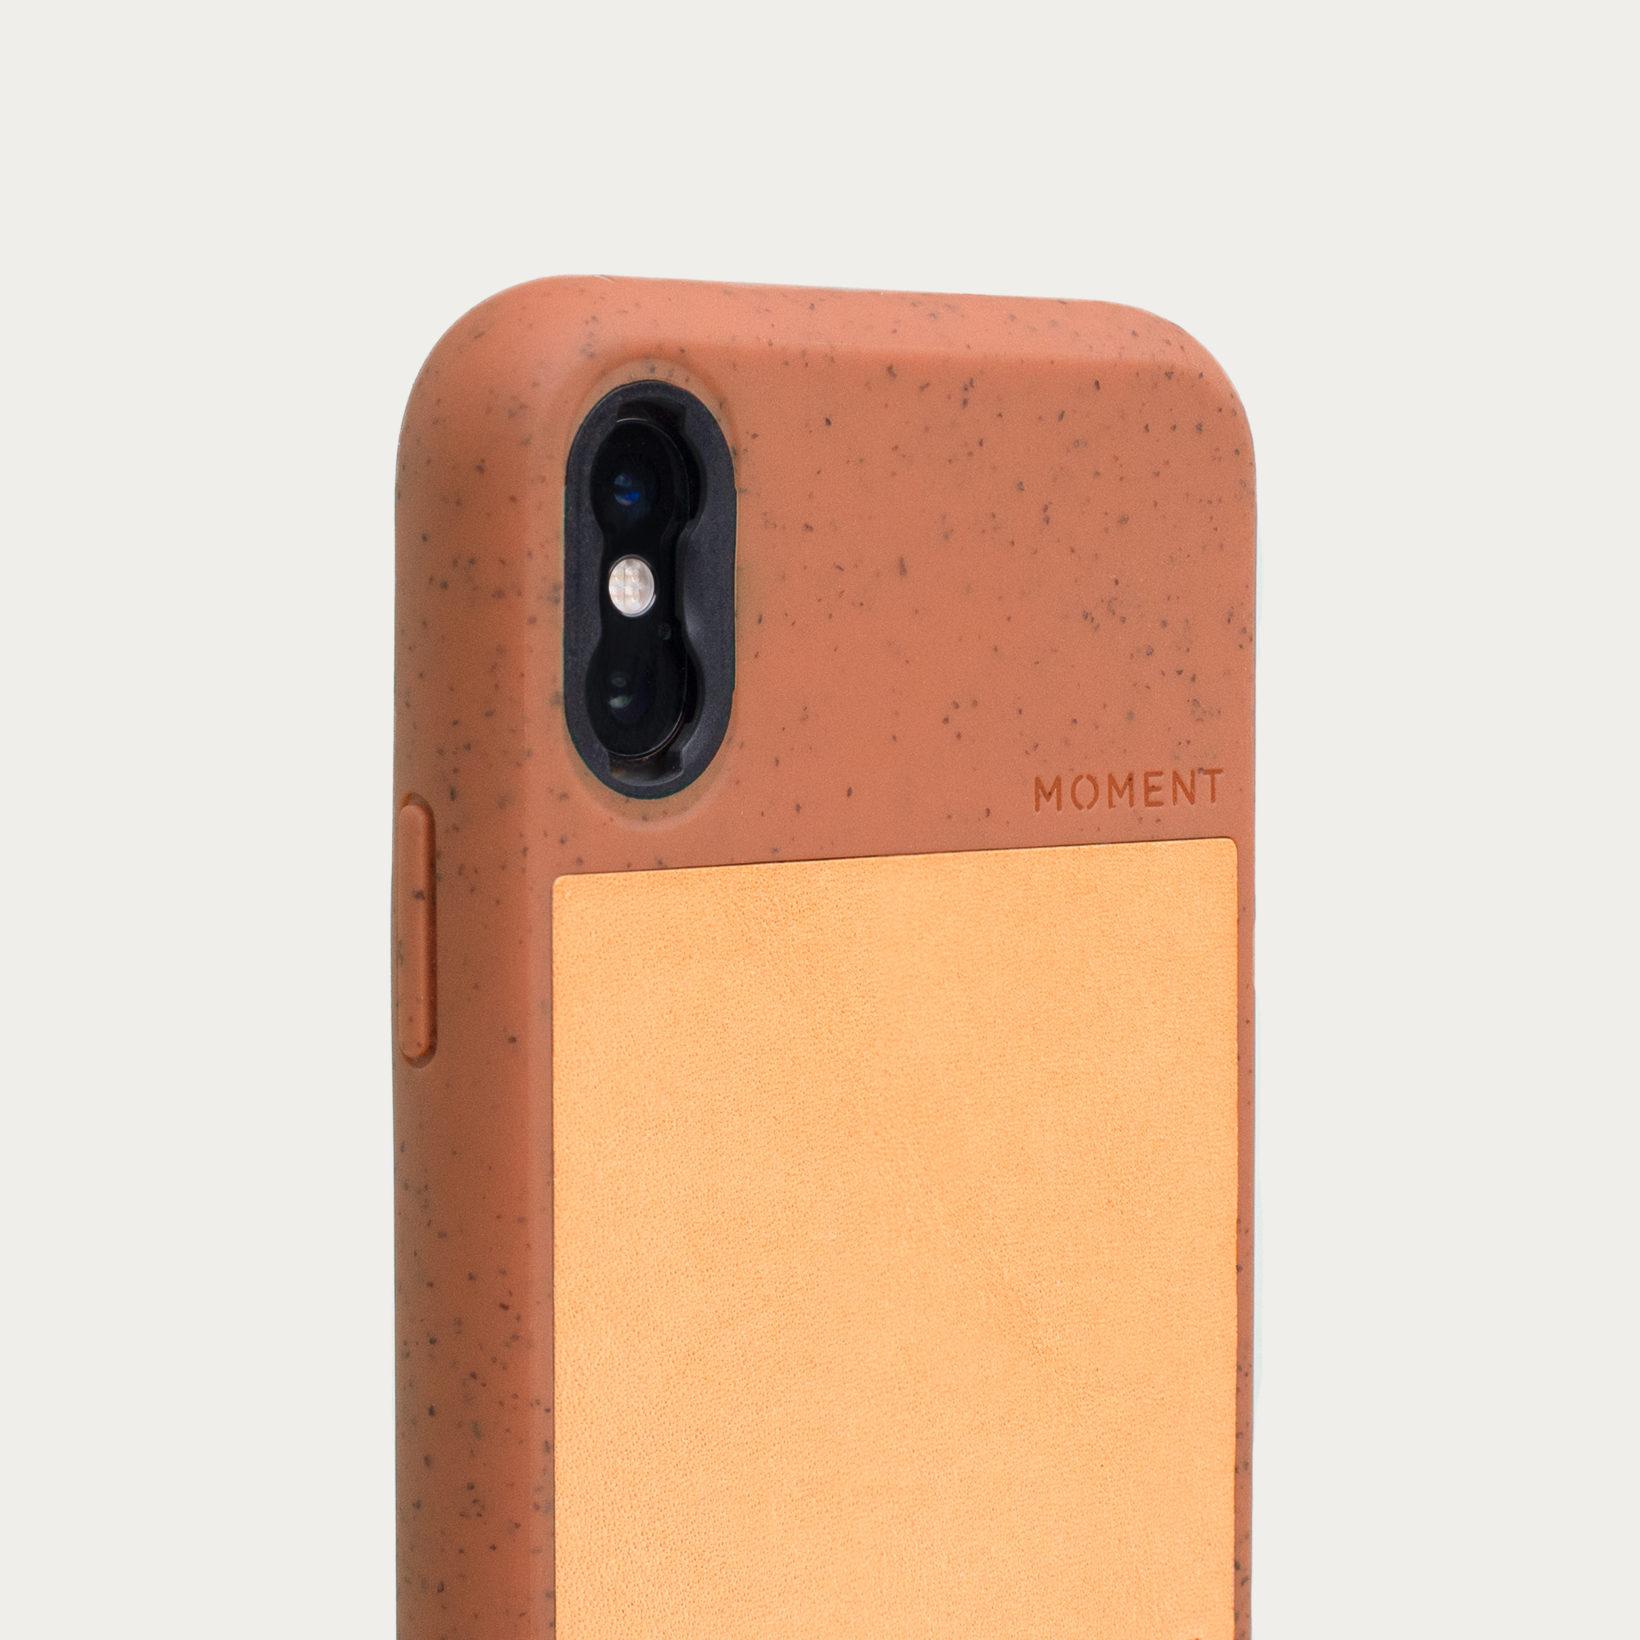 hot sales 65790 51a89 iPhone Photo Case | iPhone XS Max Photo Case in Terracotta